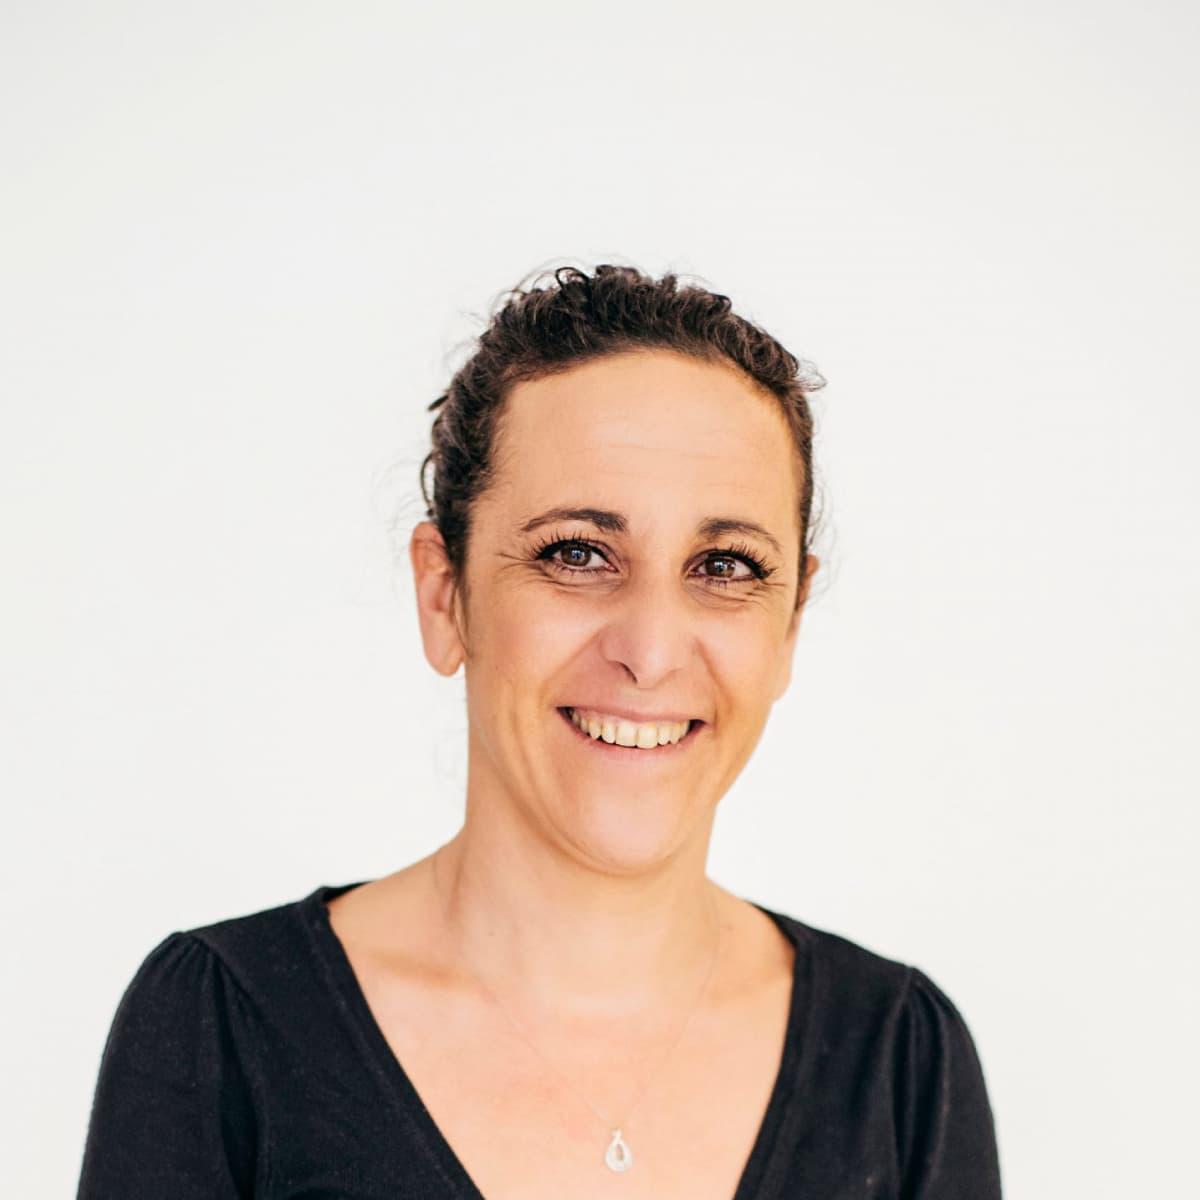 Aurélie Cherino